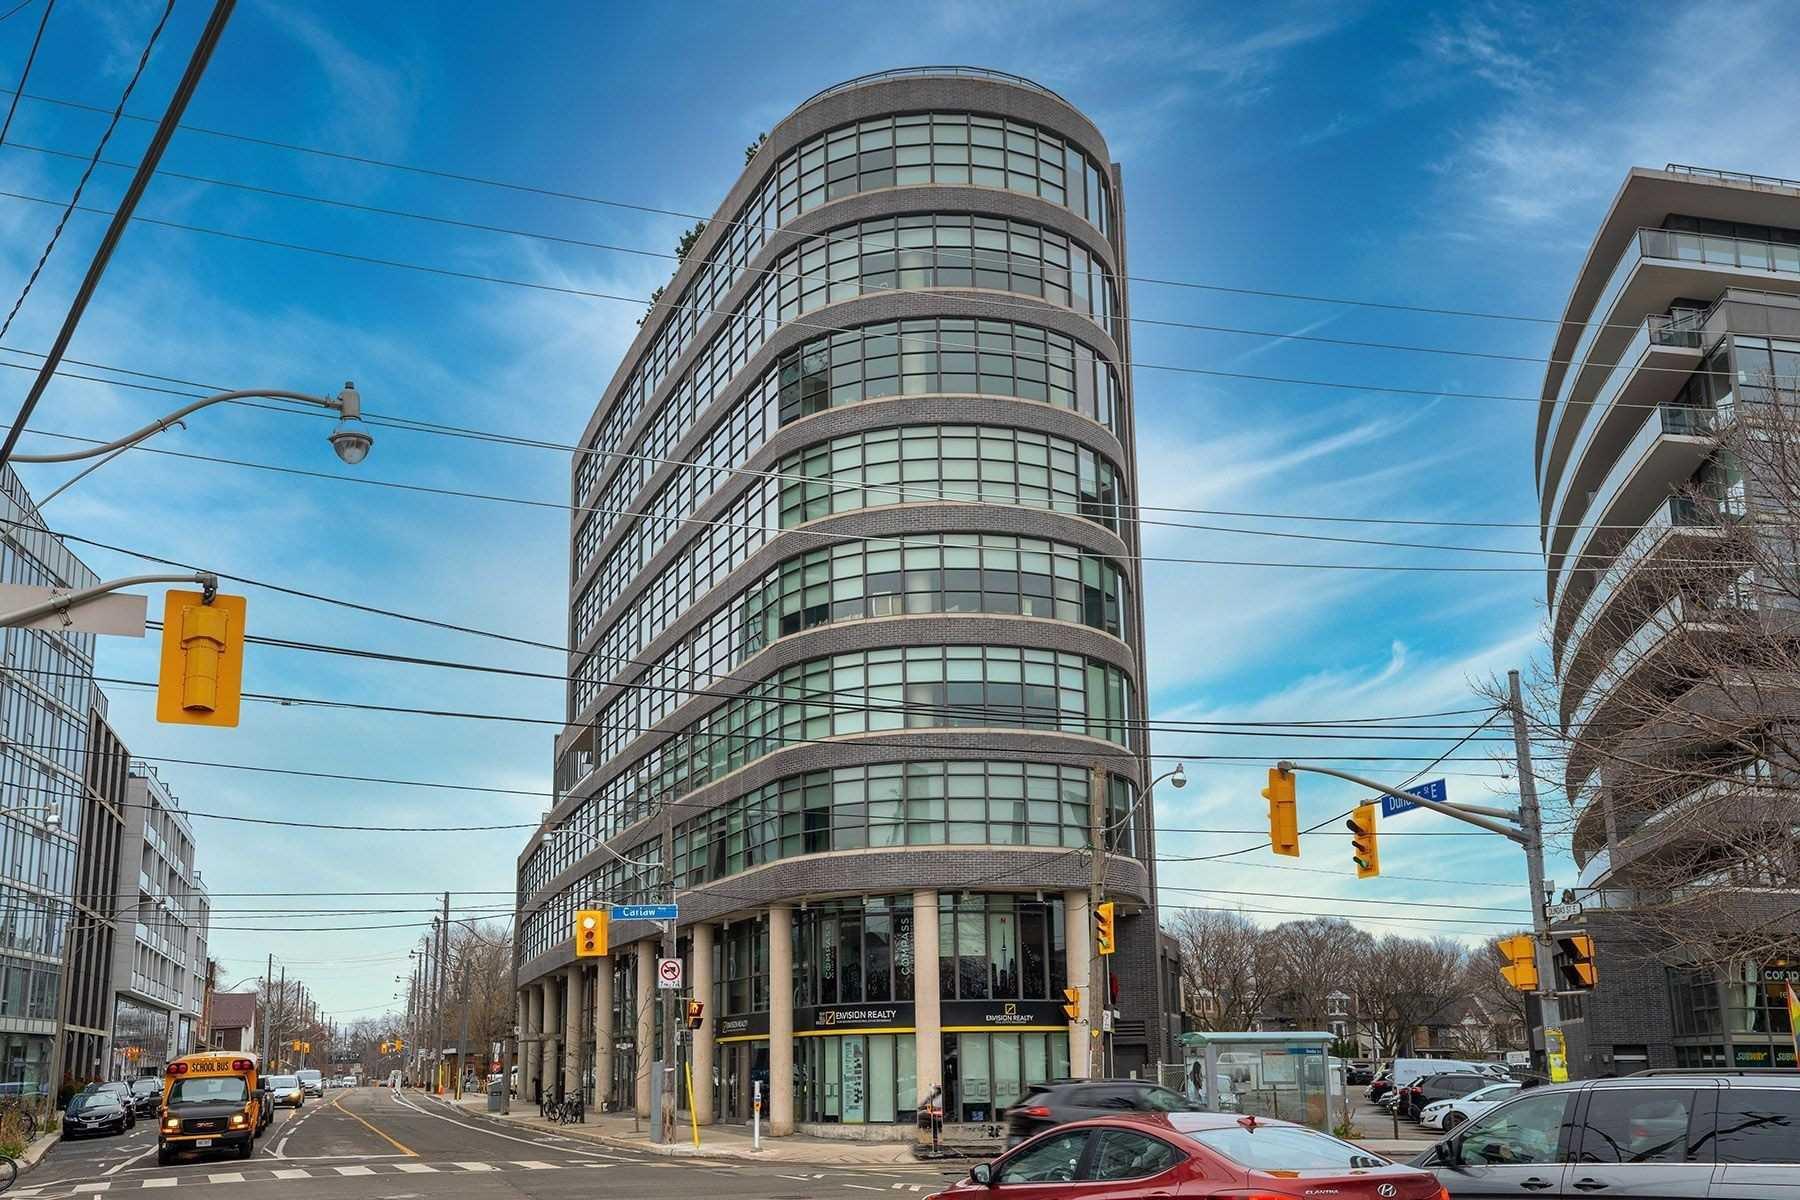 Main Photo: 609 1201 E Dundas Street in Toronto: South Riverdale Condo for sale (Toronto E01)  : MLS®# E5000630